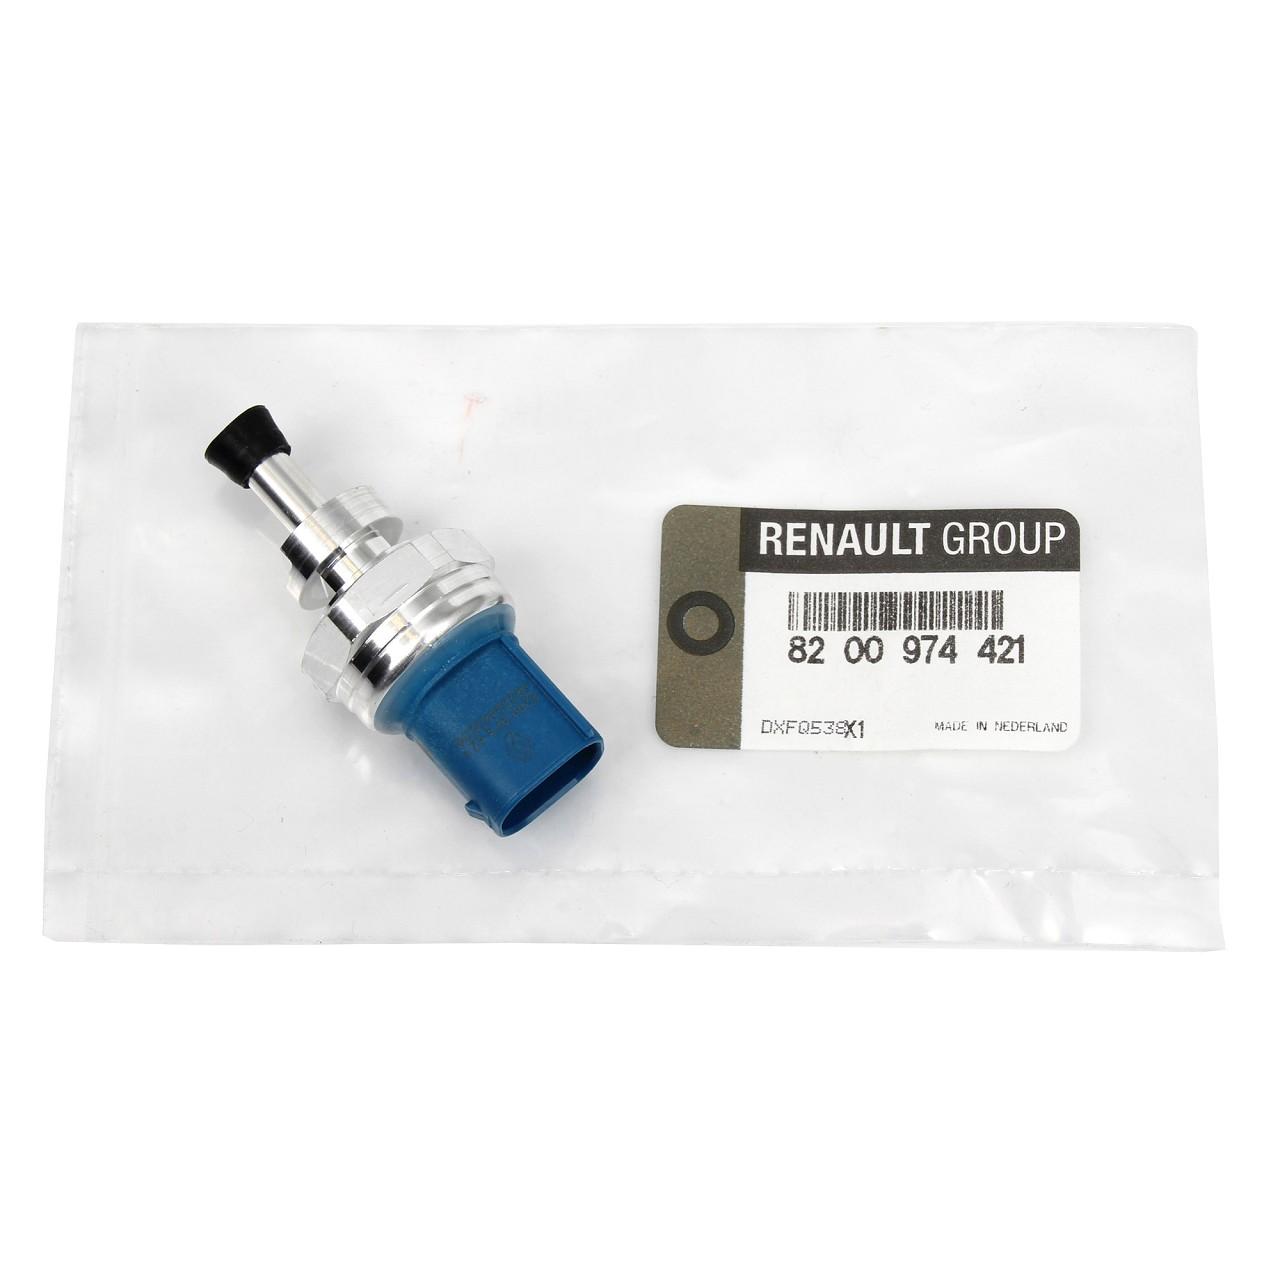 ORIGINAL Renault Abgasdrucksensor Kangoo 1.5dCi Trafic III 1.6dCi 8200974421